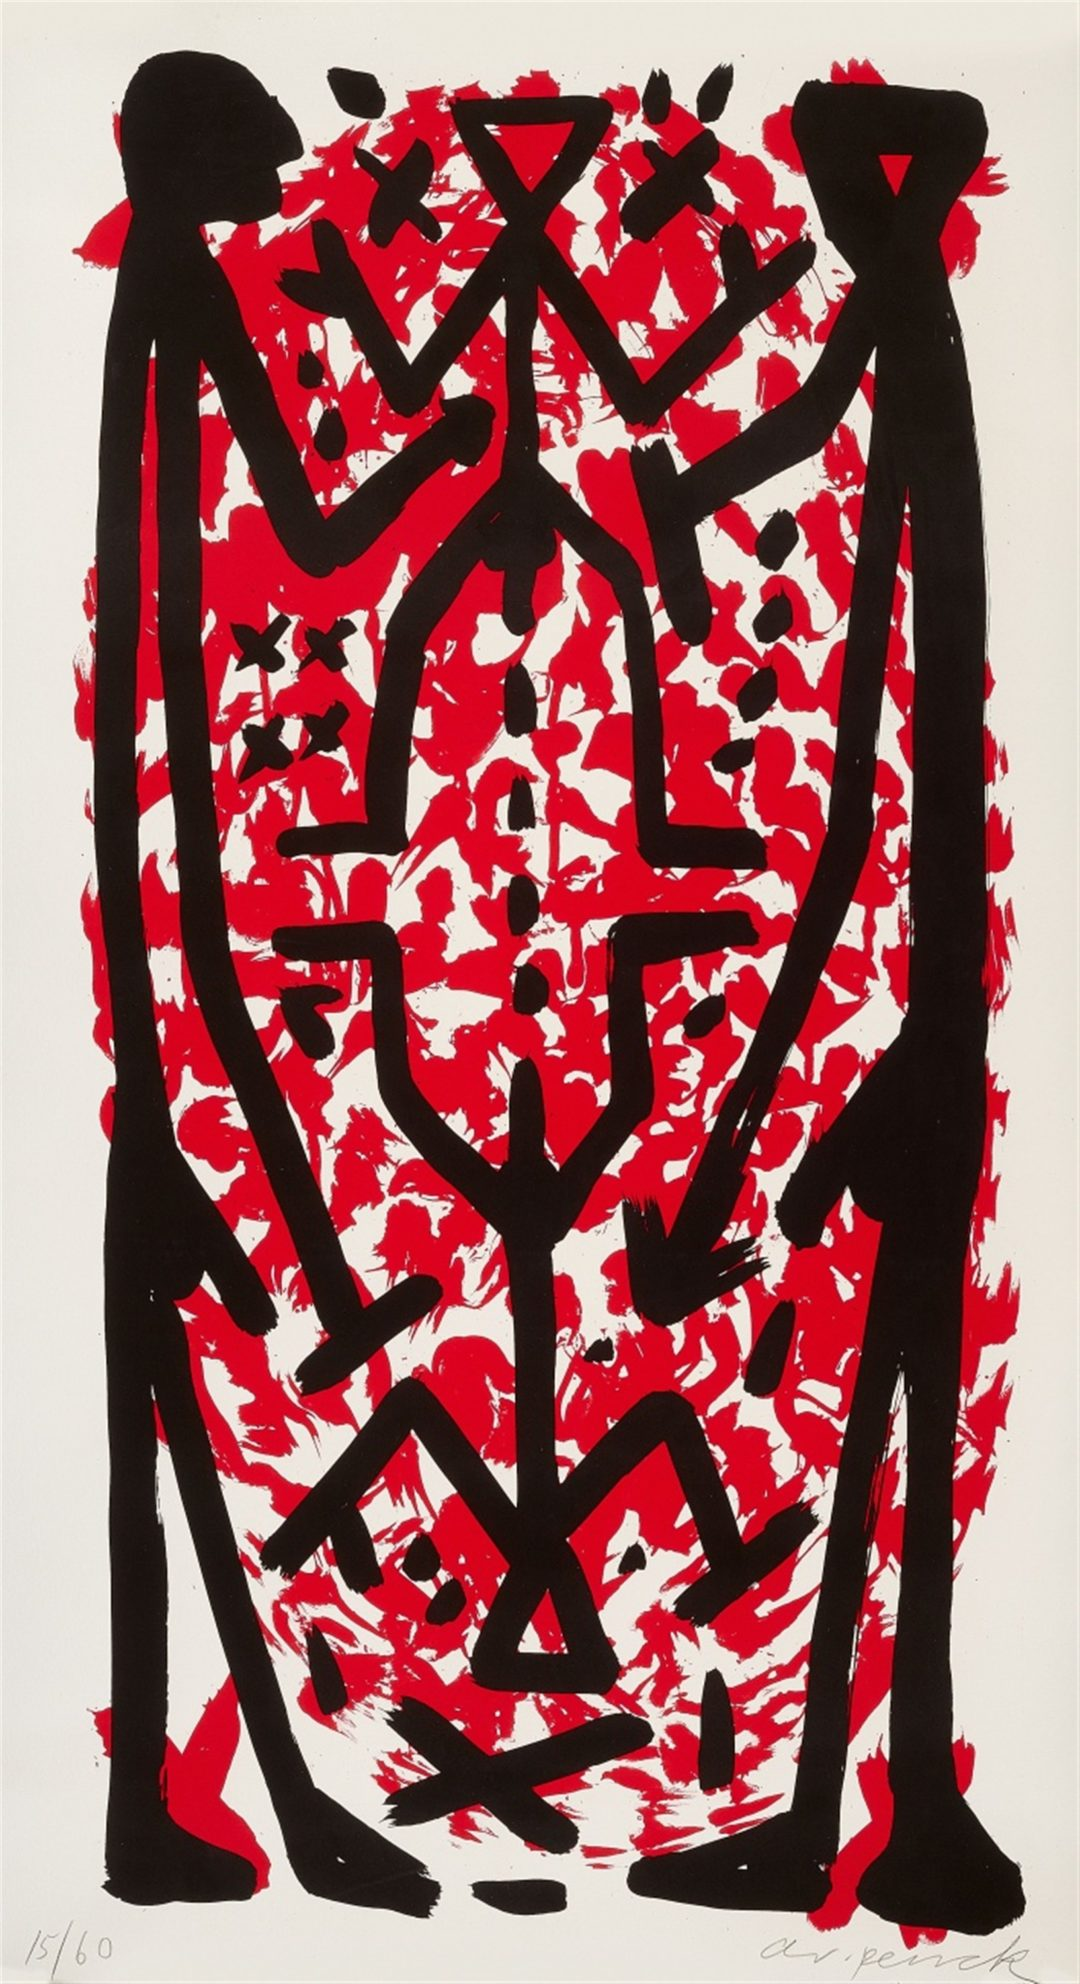 A.R. Penck-Standart hoch C-litho 10/60-110×160-1997